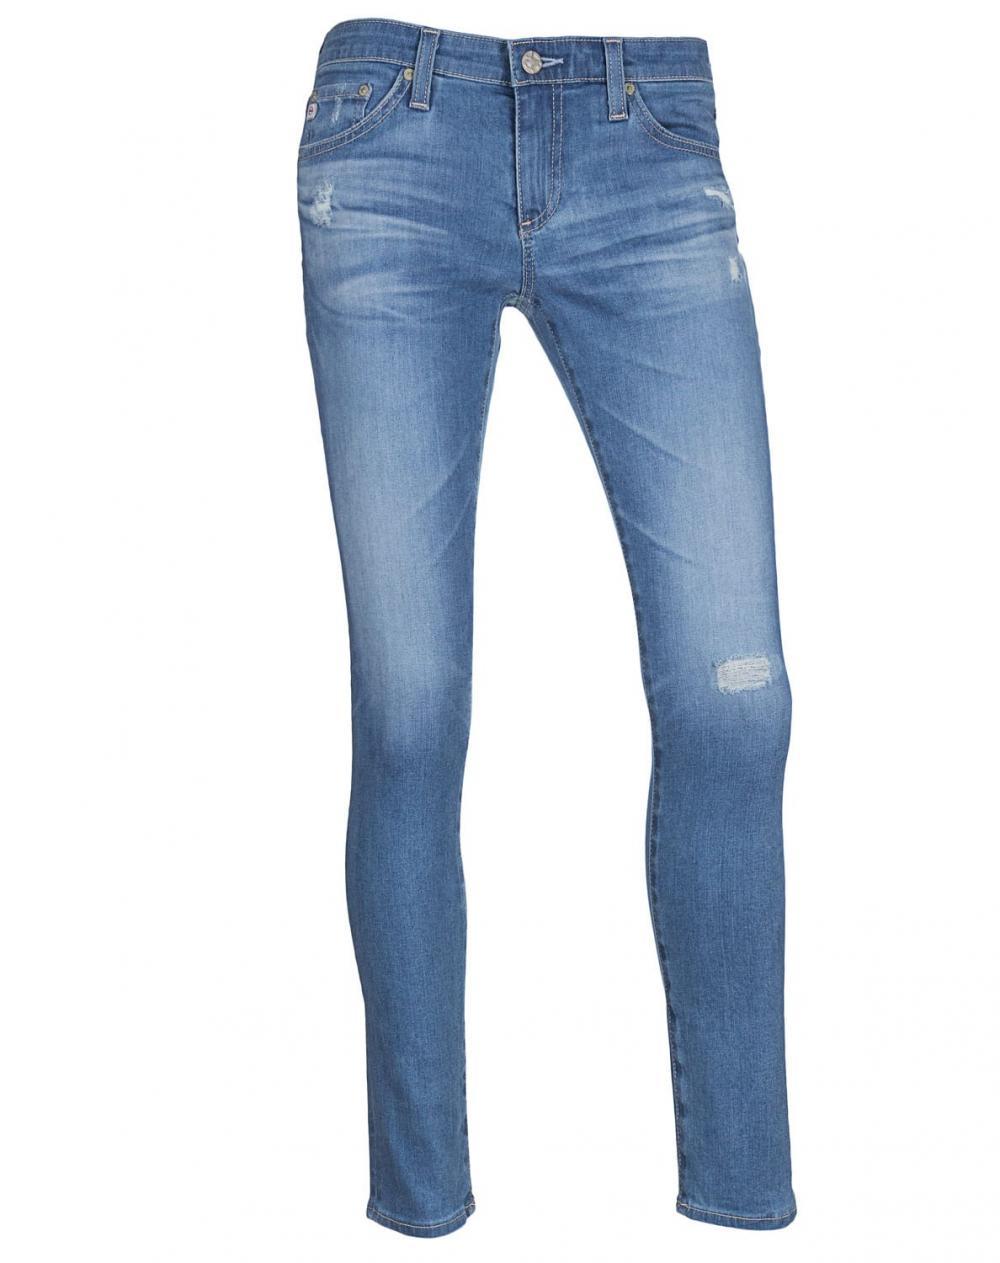 Jeans Legging Ankle SVO